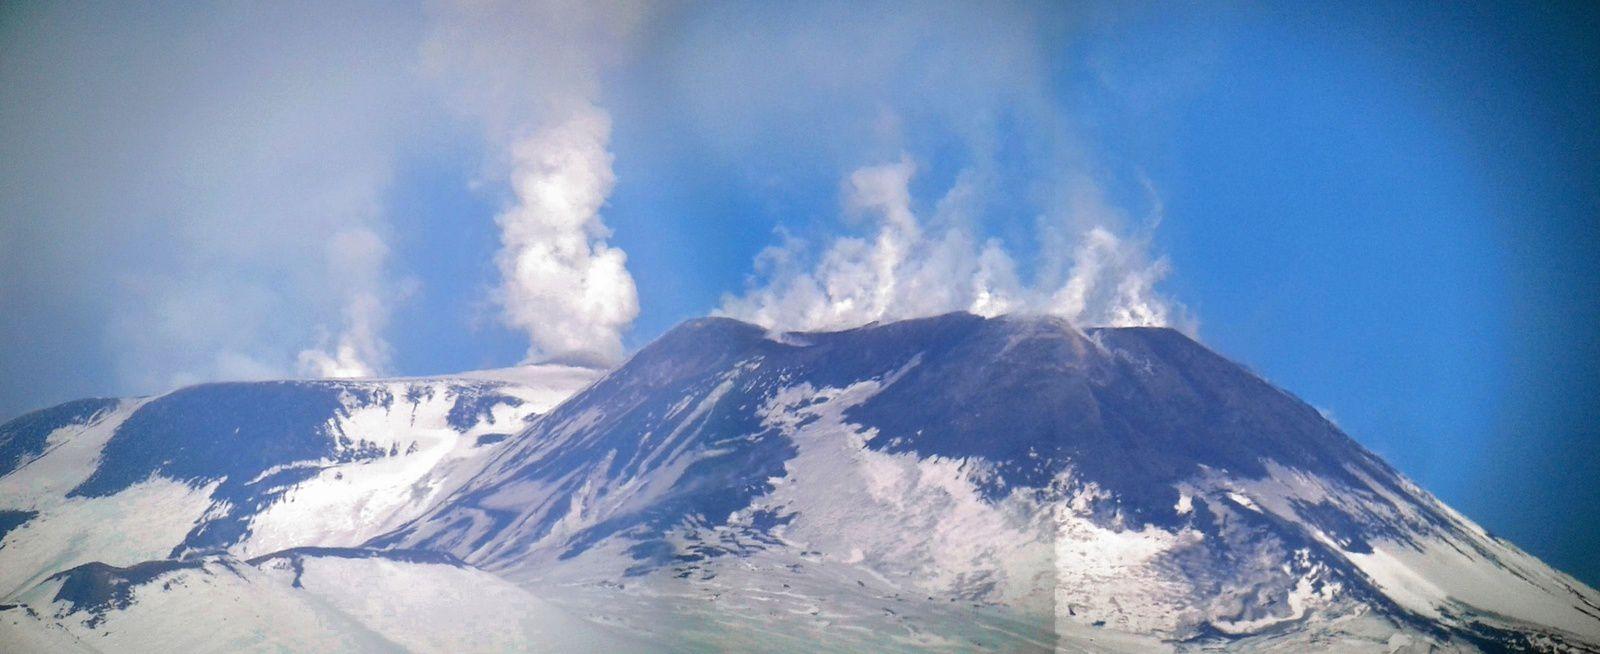 Etna - sommet émissions de vapeurs - photo 01.01.2017 / Boris Behncke